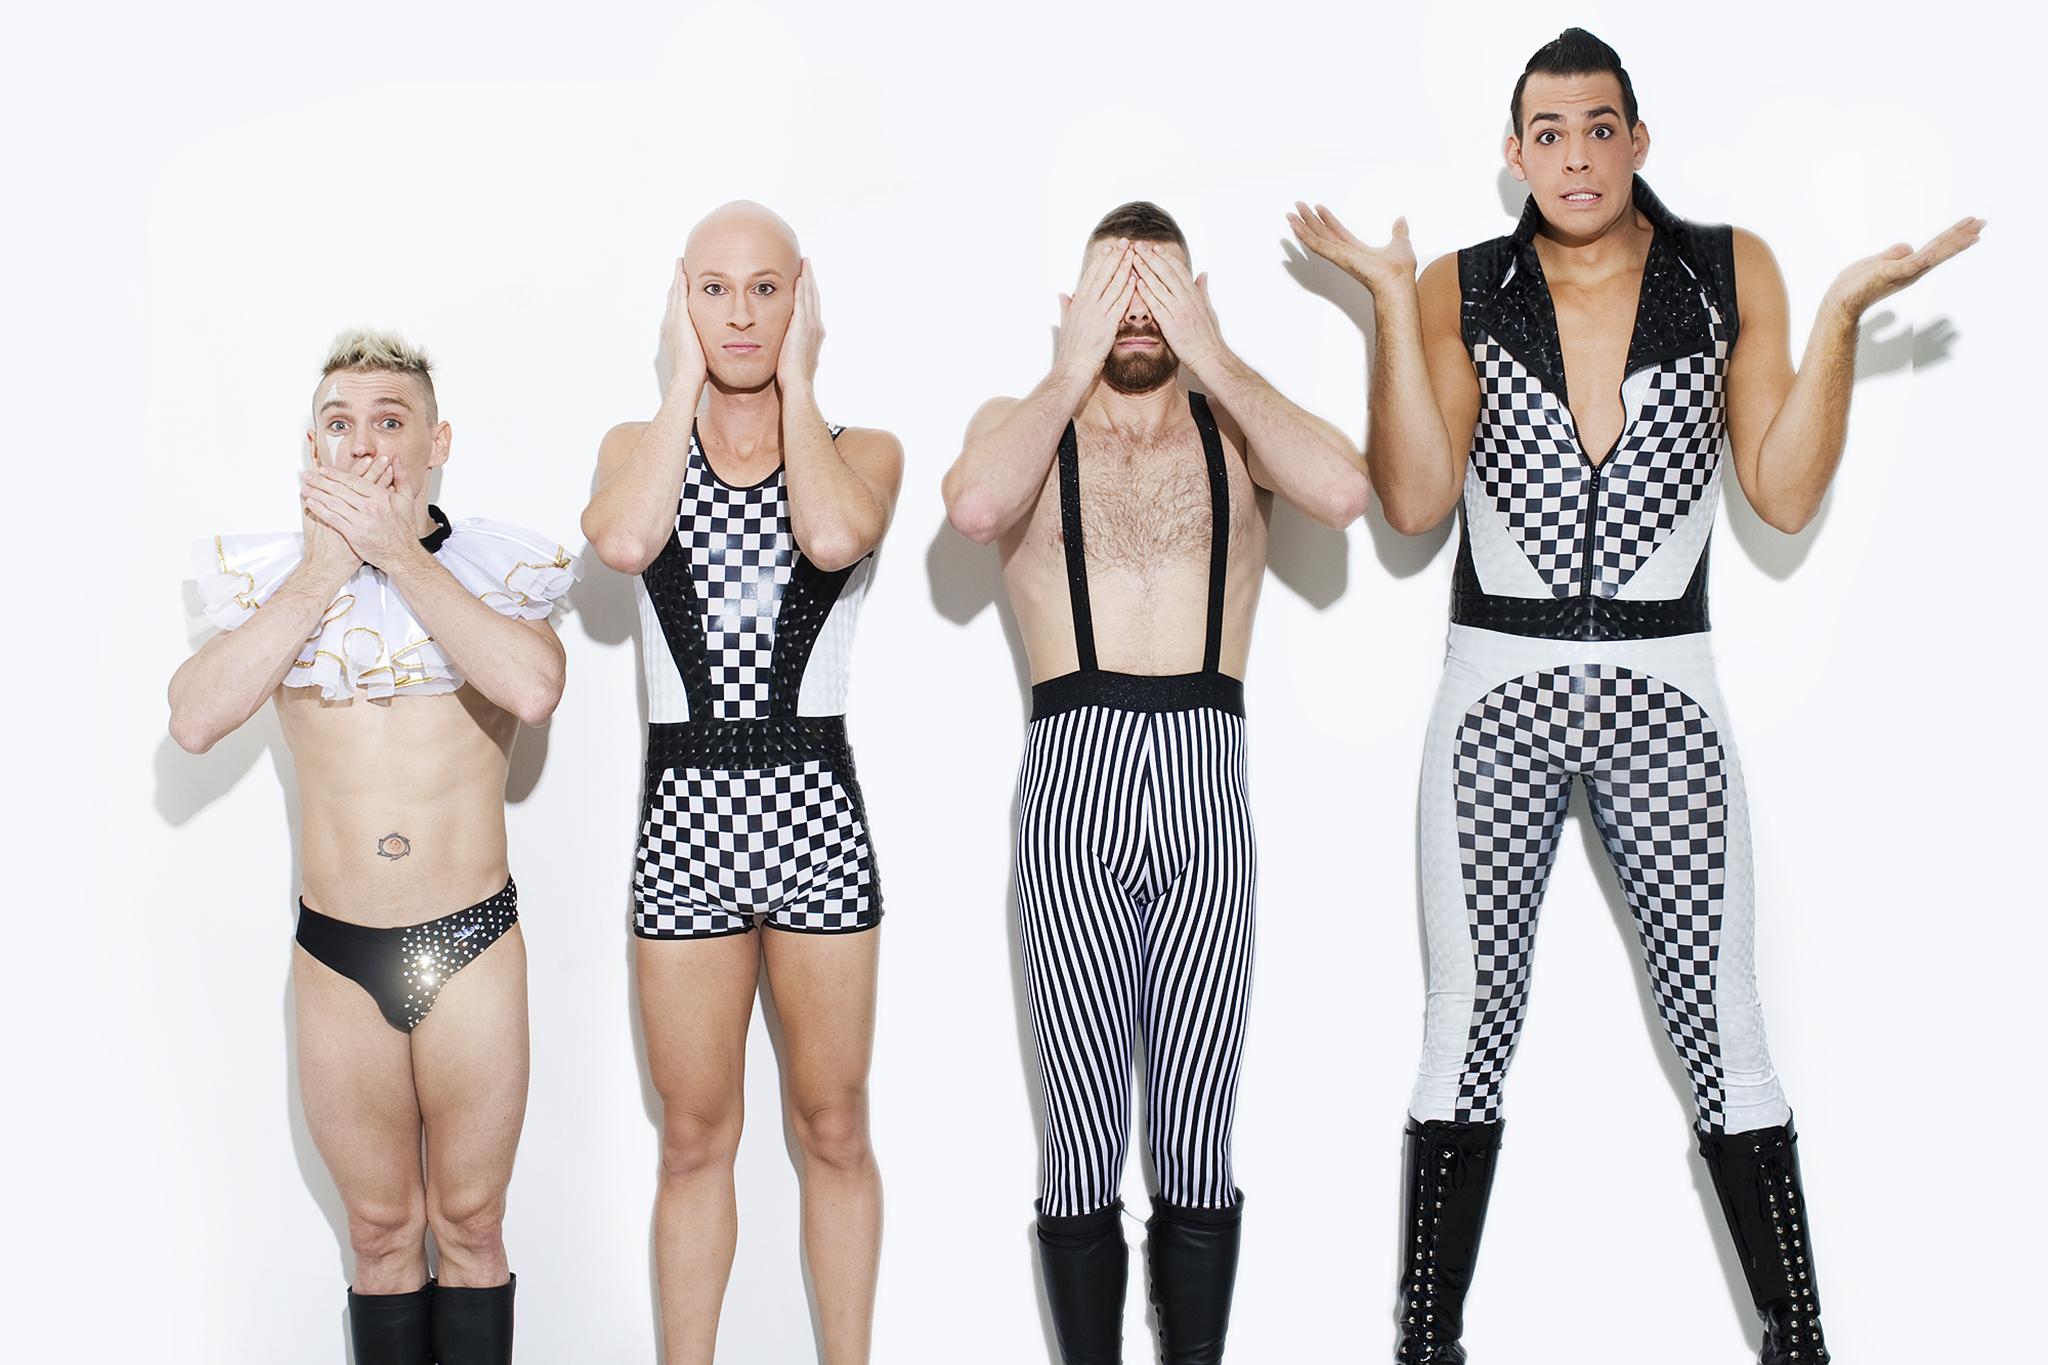 Boys' Night: An All-Male Cirquelesque Revue